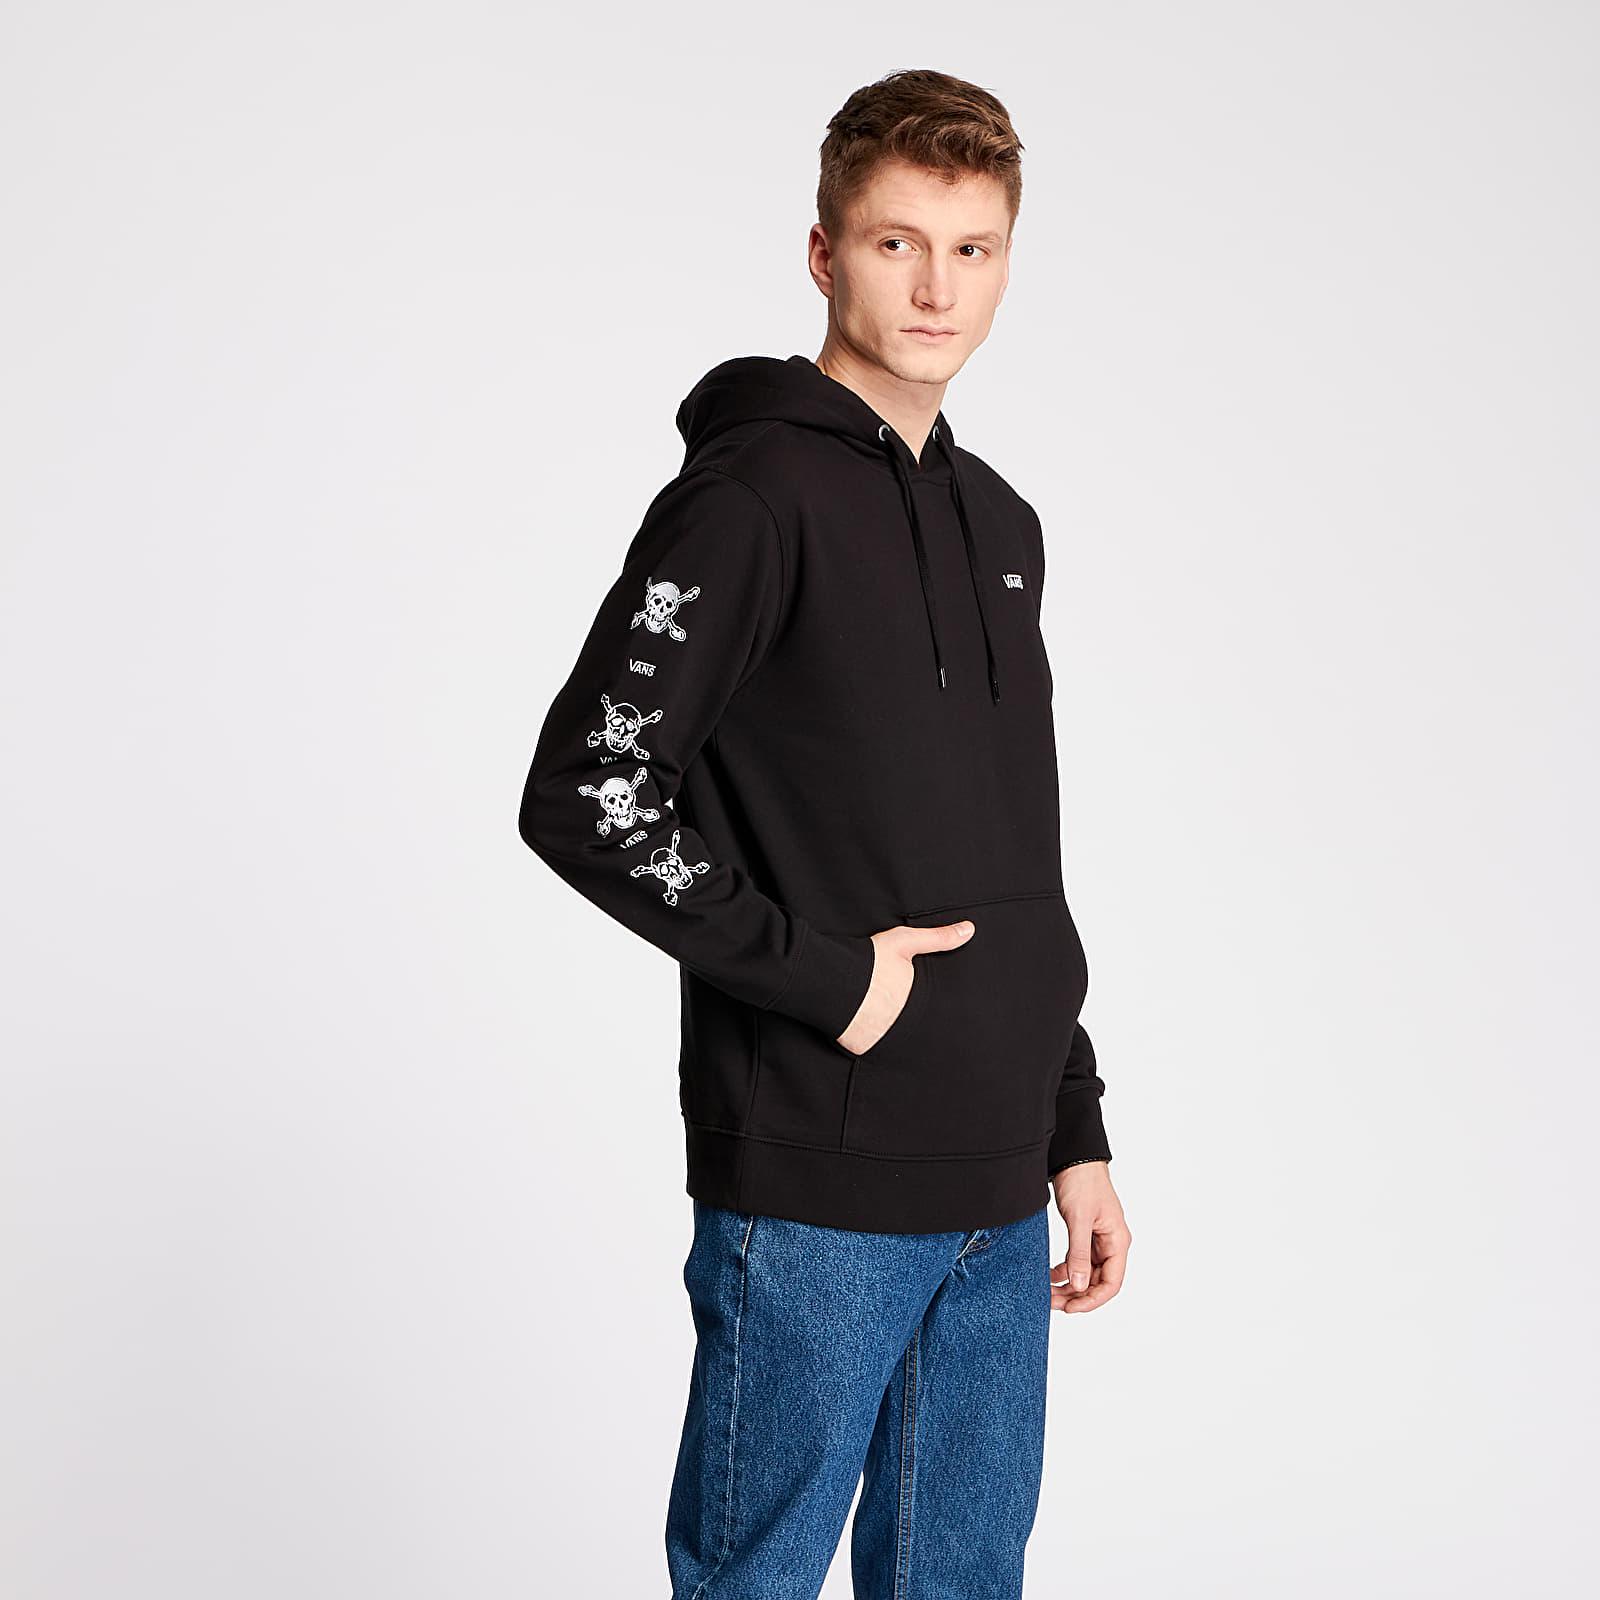 Sweatshirts Vans Sweatshirt Anaheim Factory Hoodie OG Skulls